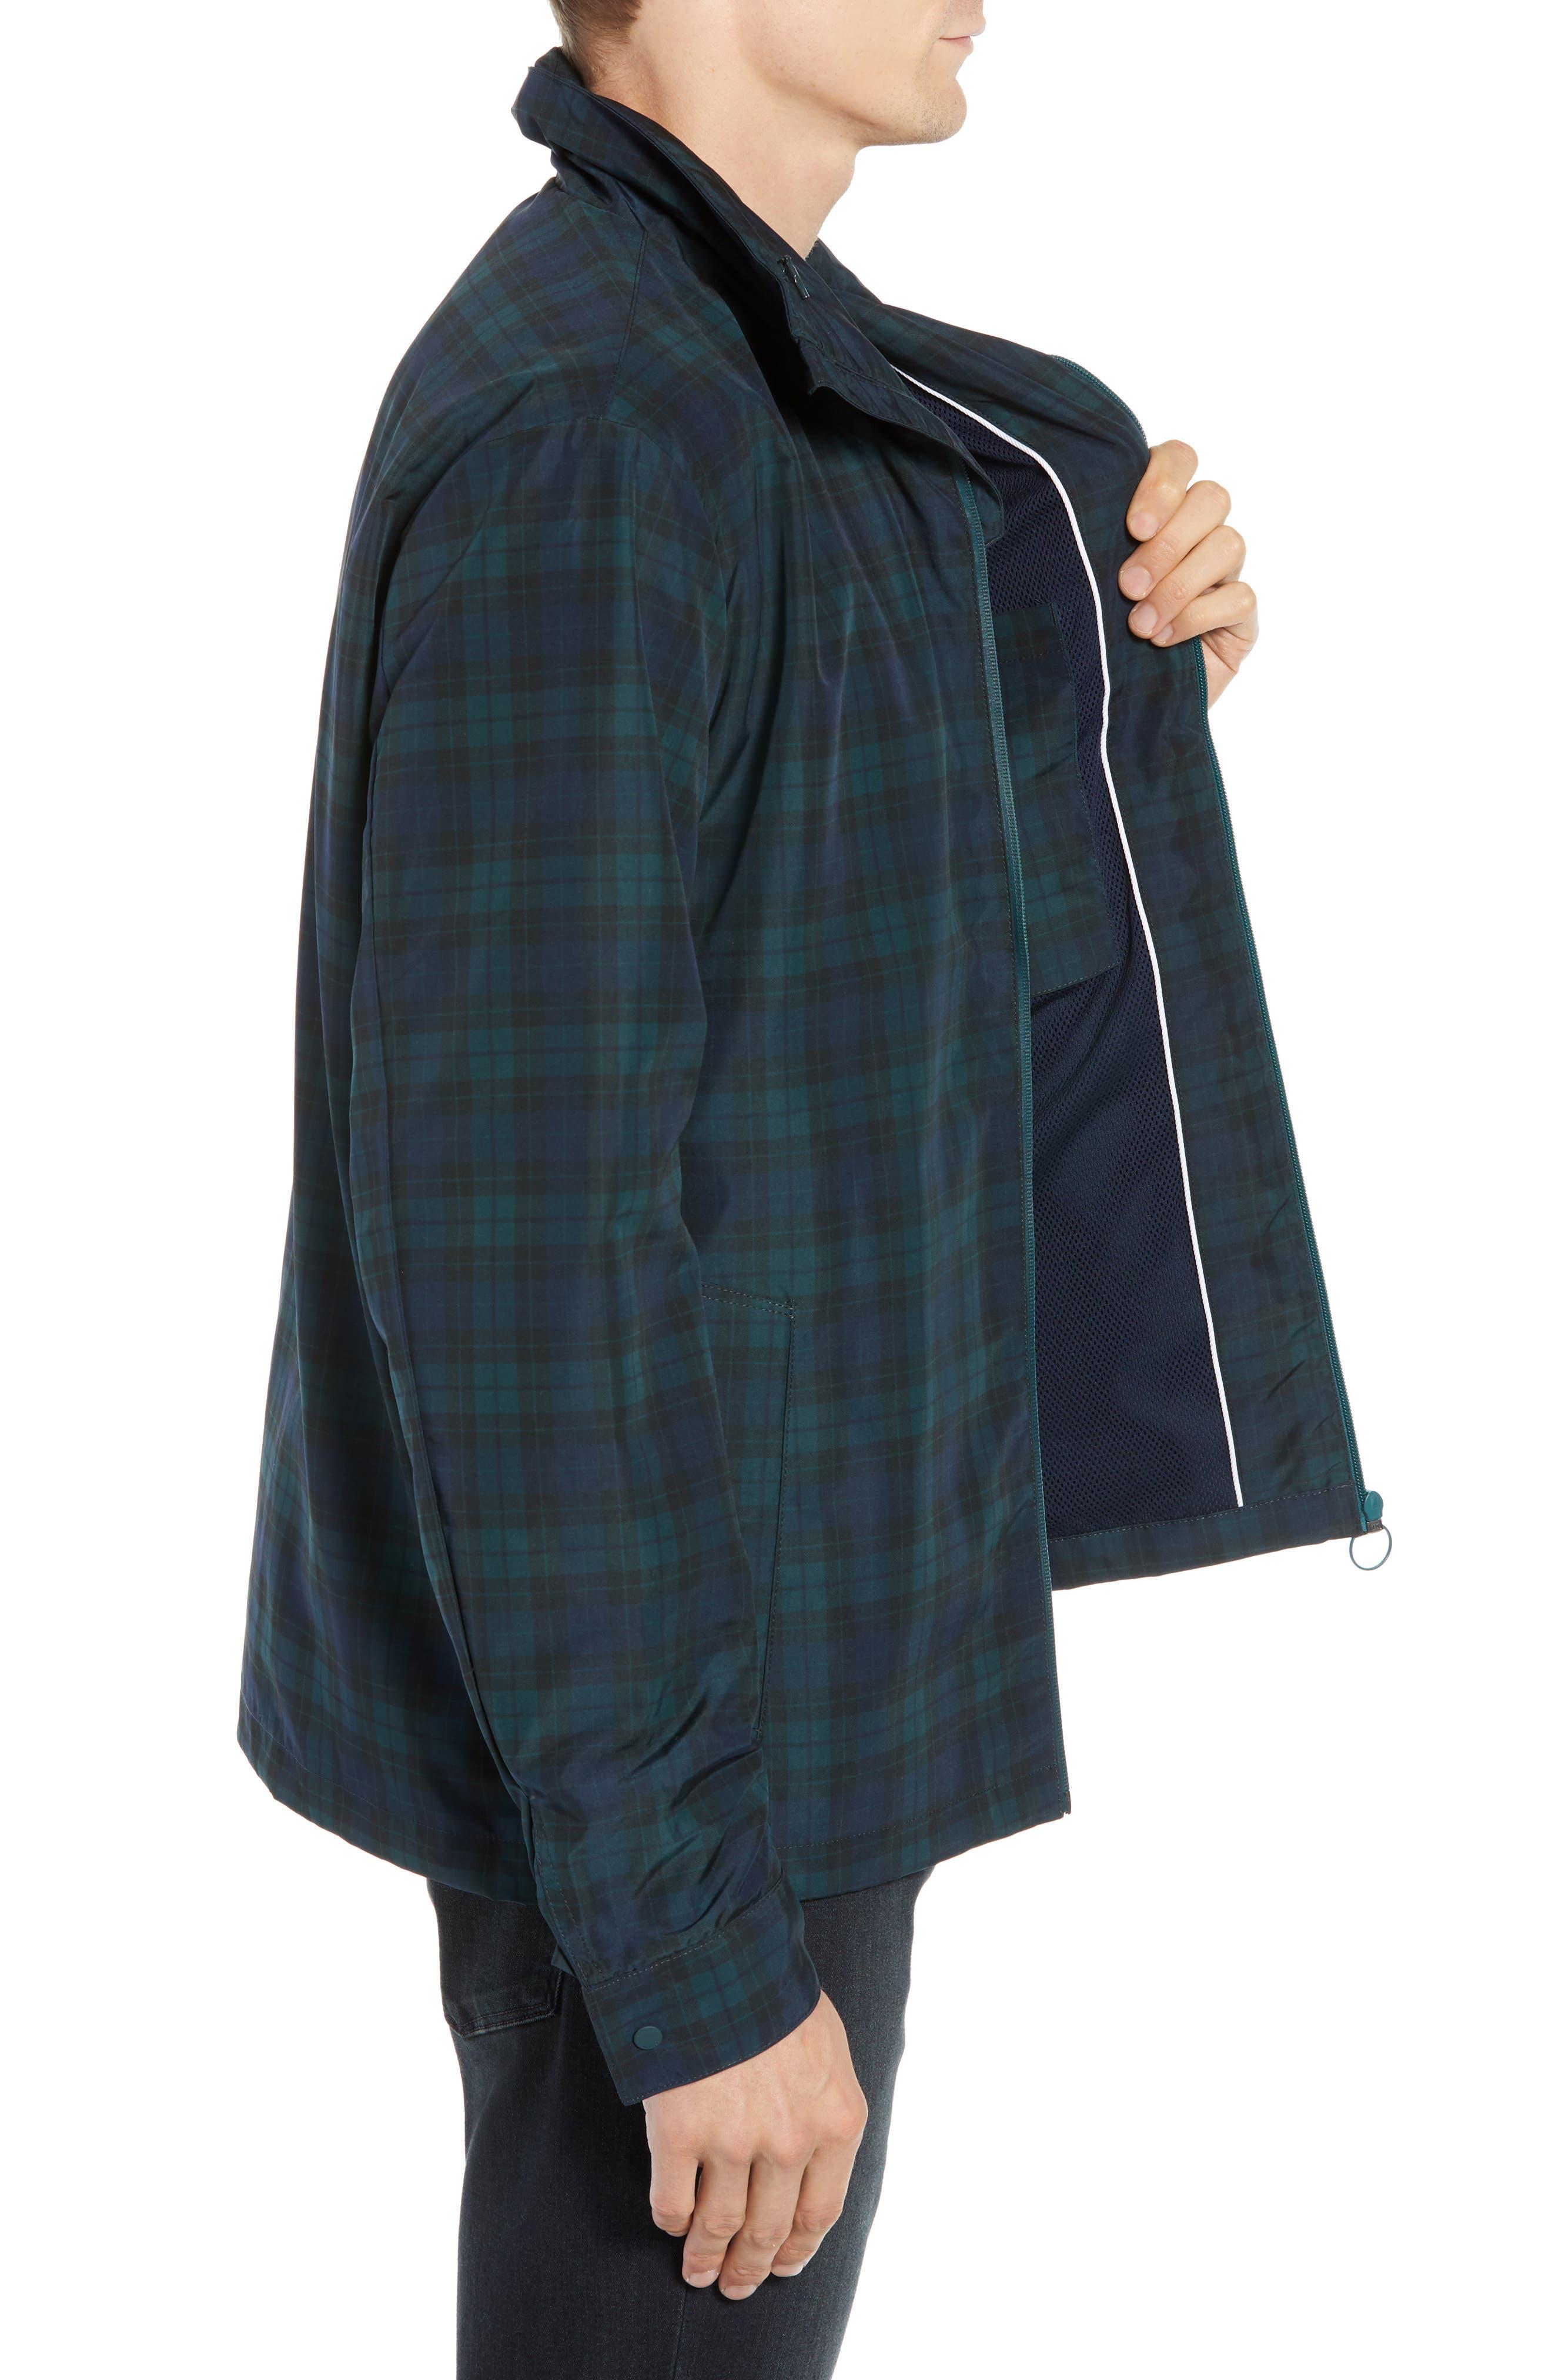 Regular Fit Check Windbreaker Jacket,                             Alternate thumbnail 3, color,                             NAVY BLUE/ SINOPLE BLACK